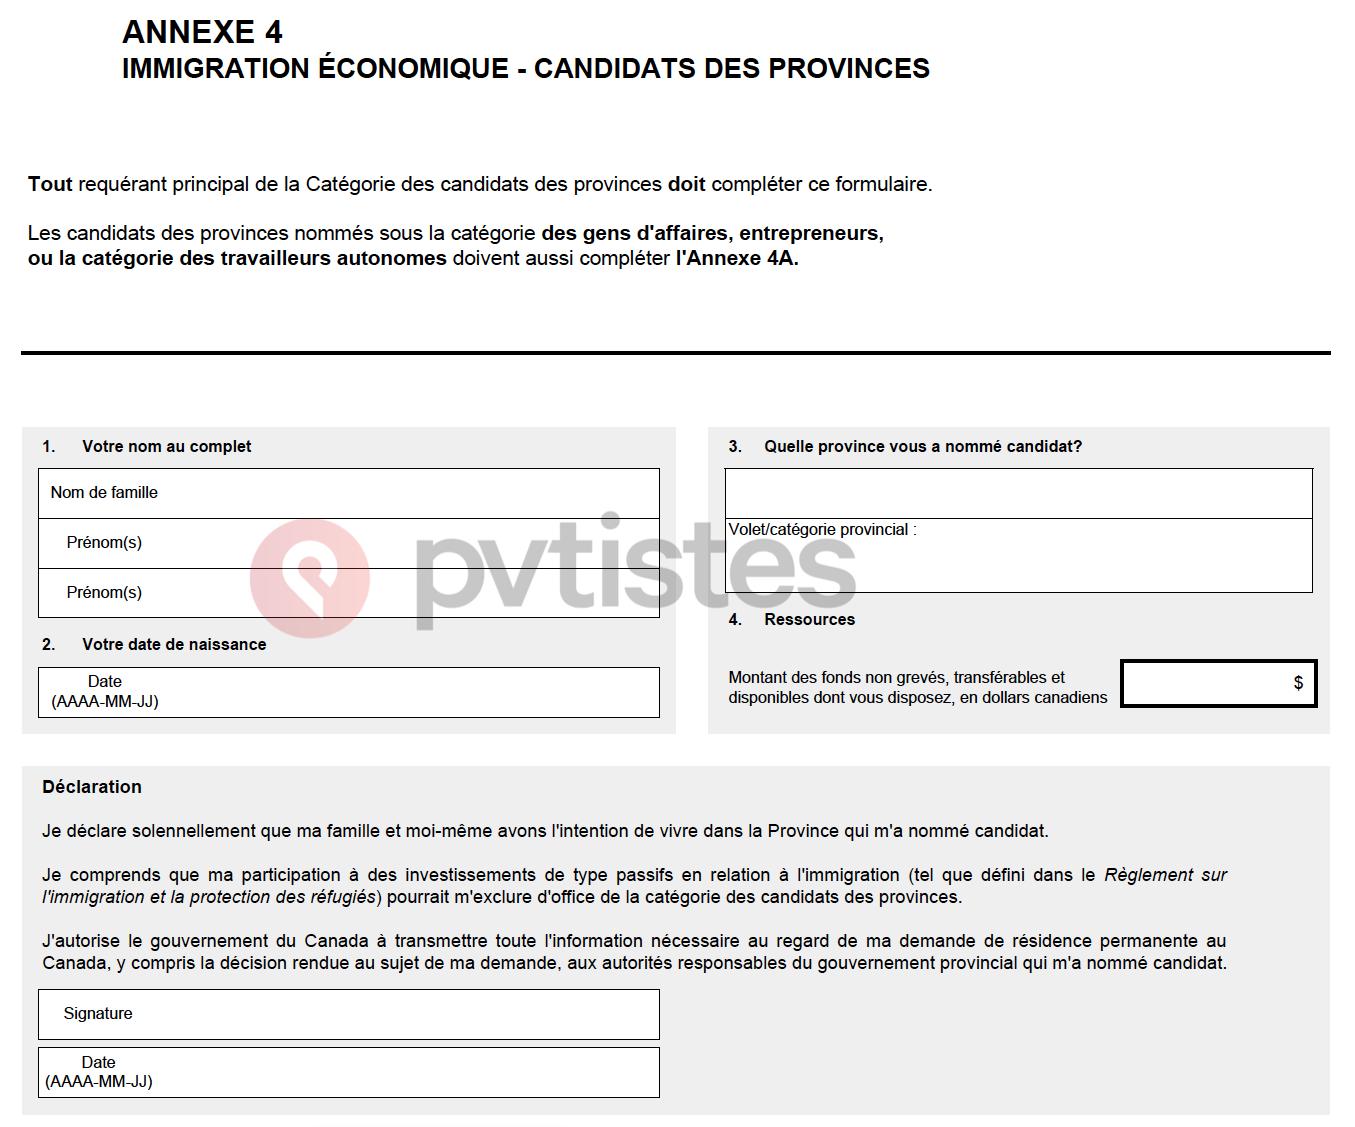 toriel Residence Permanente Canada - Federal 21